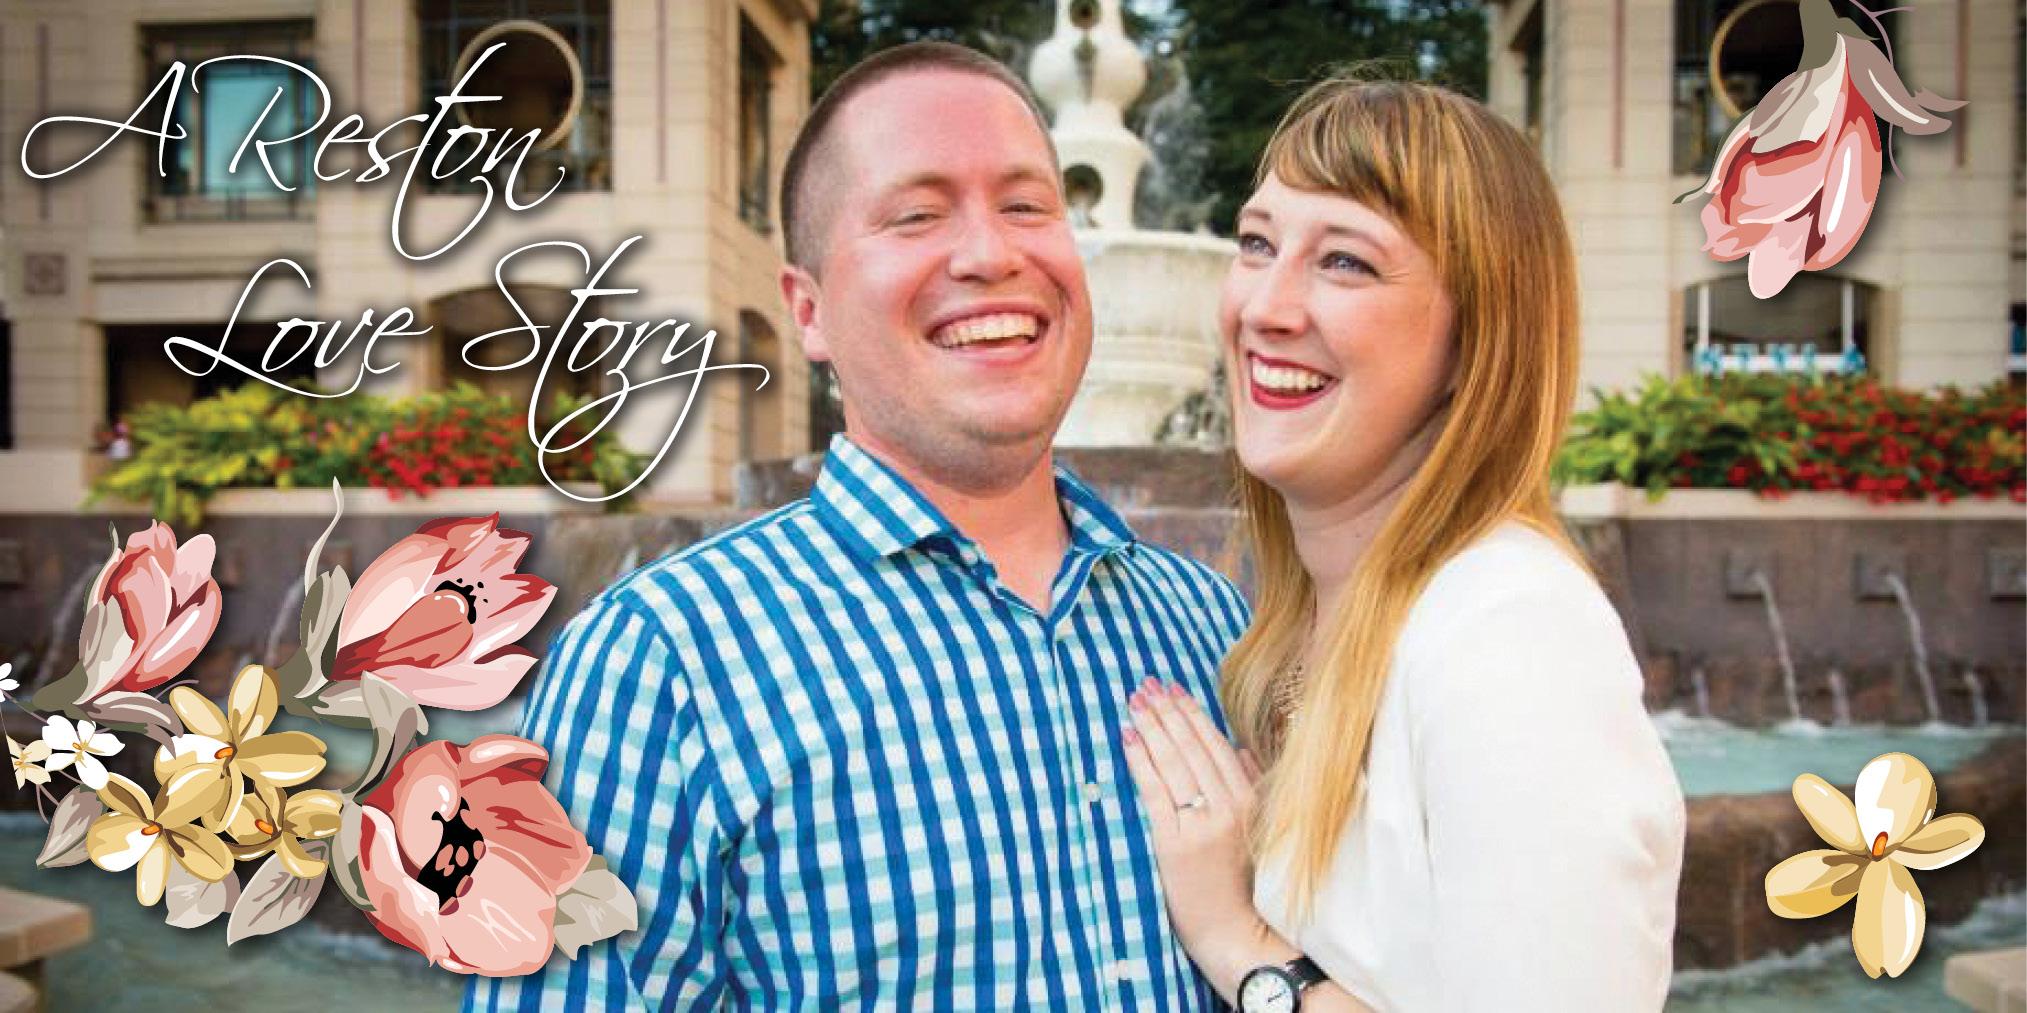 A Reston Love Story